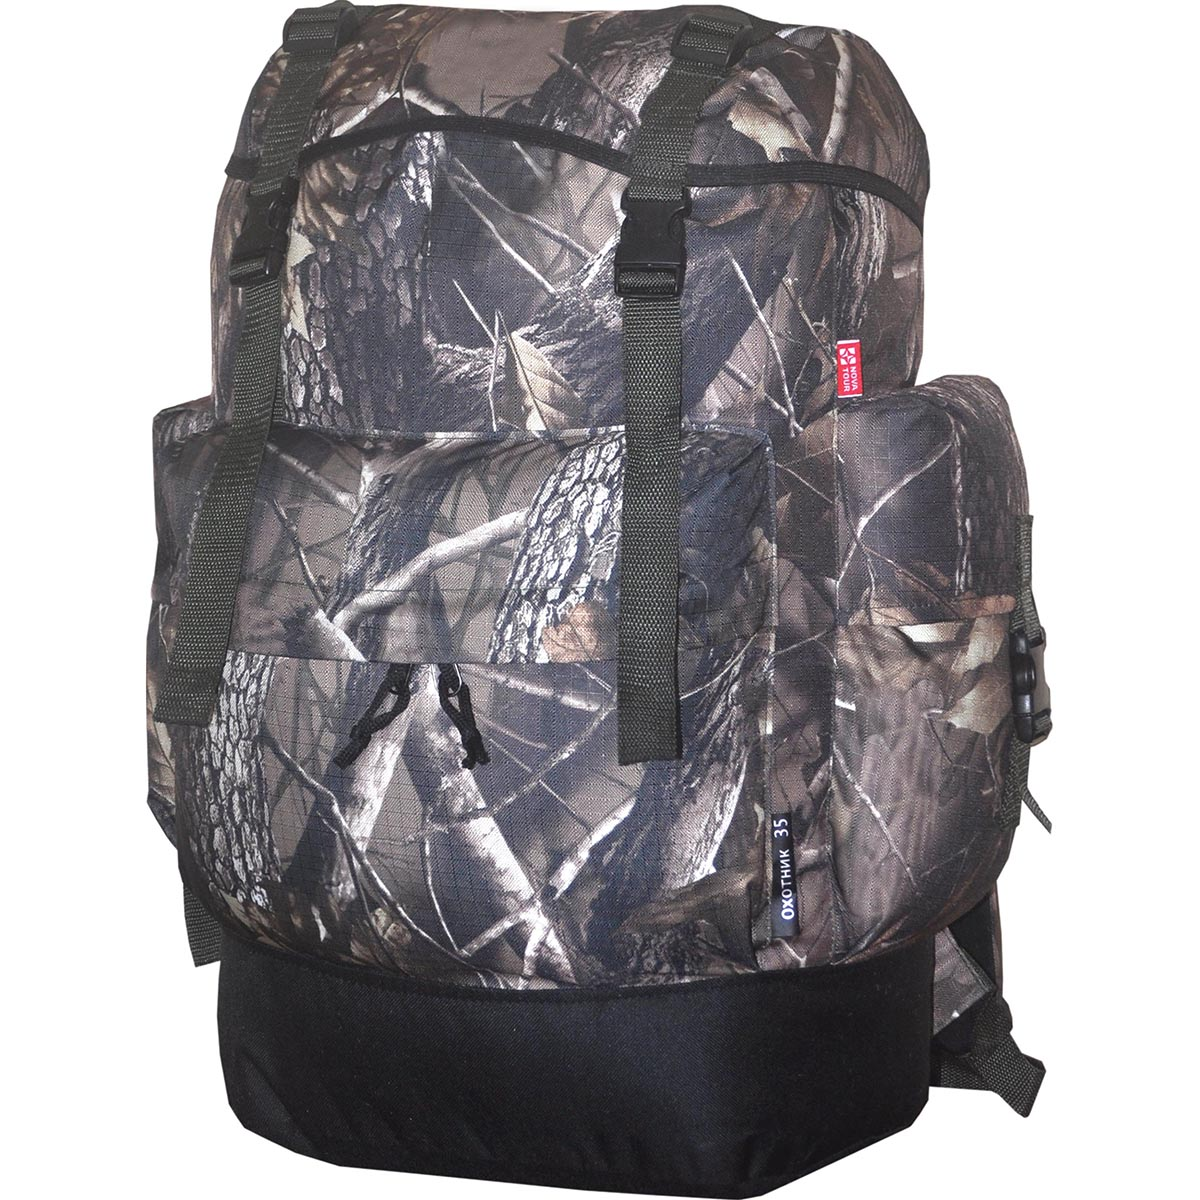 Рюкзак для охоты Hunterman Nova Tour Охотник 35 V3 км, цвет: лес, 35 л рюкзак nova tour hunterman охотник 70 v3 км forest